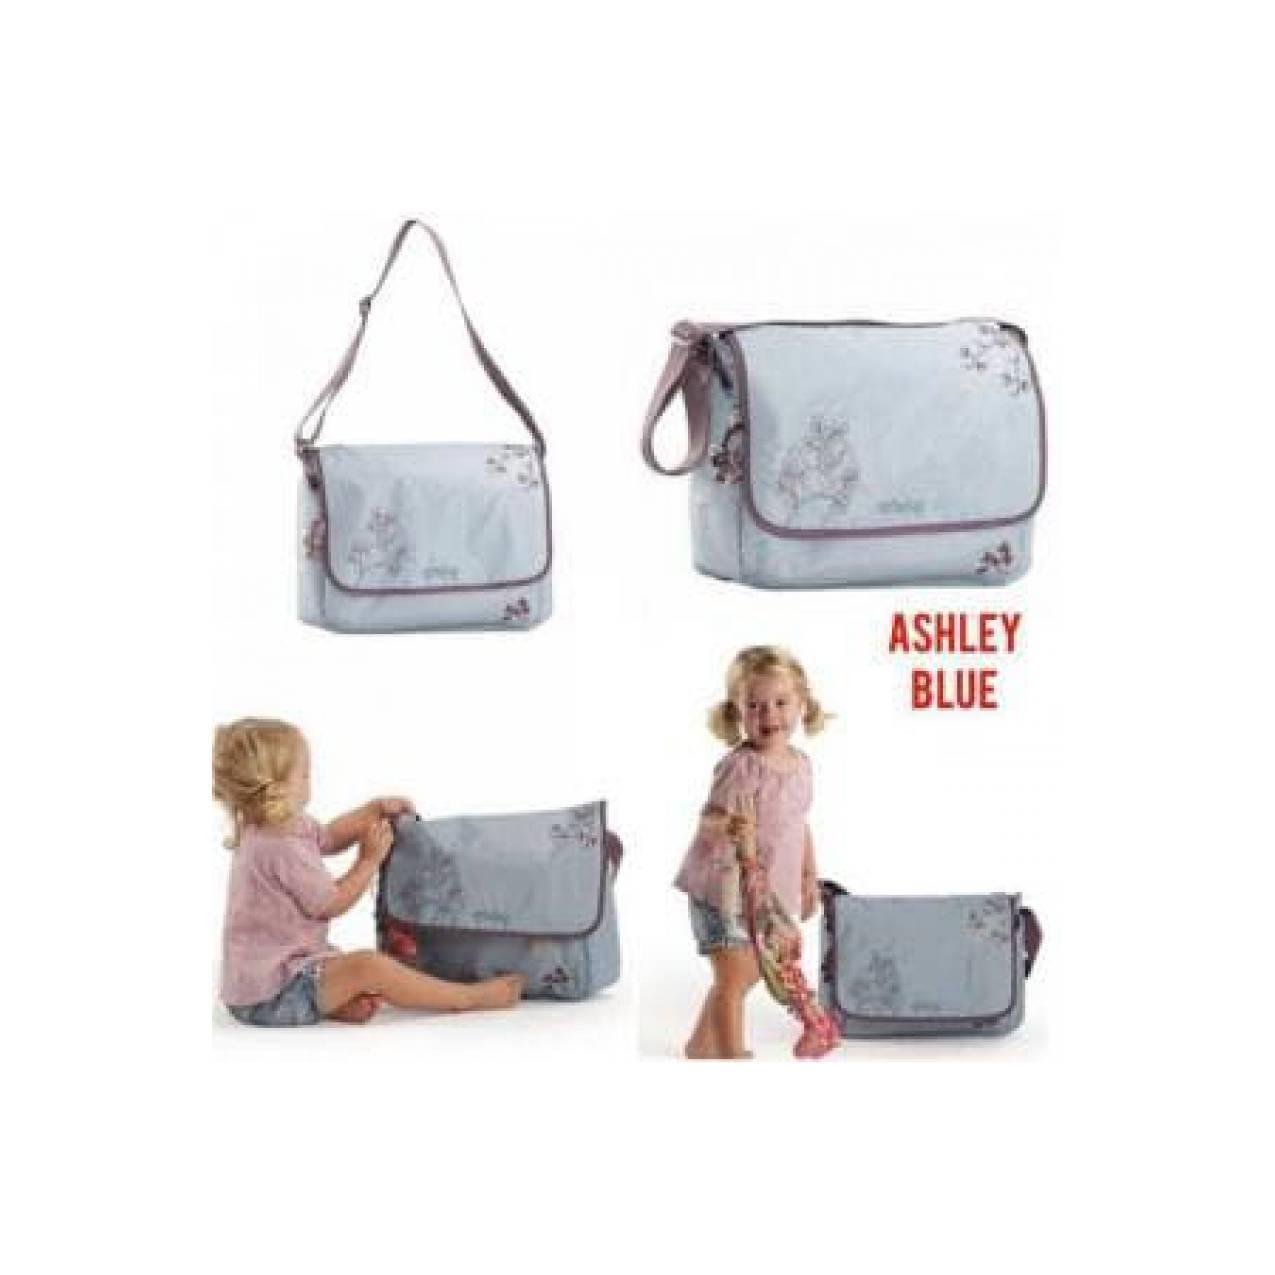 Jual Okiedog Sidamo Cupid Flint Size Color Purple Age 0m Welcome Flower Power Ashley Blue Diaper Bag Tas Perlengkapan Bayi